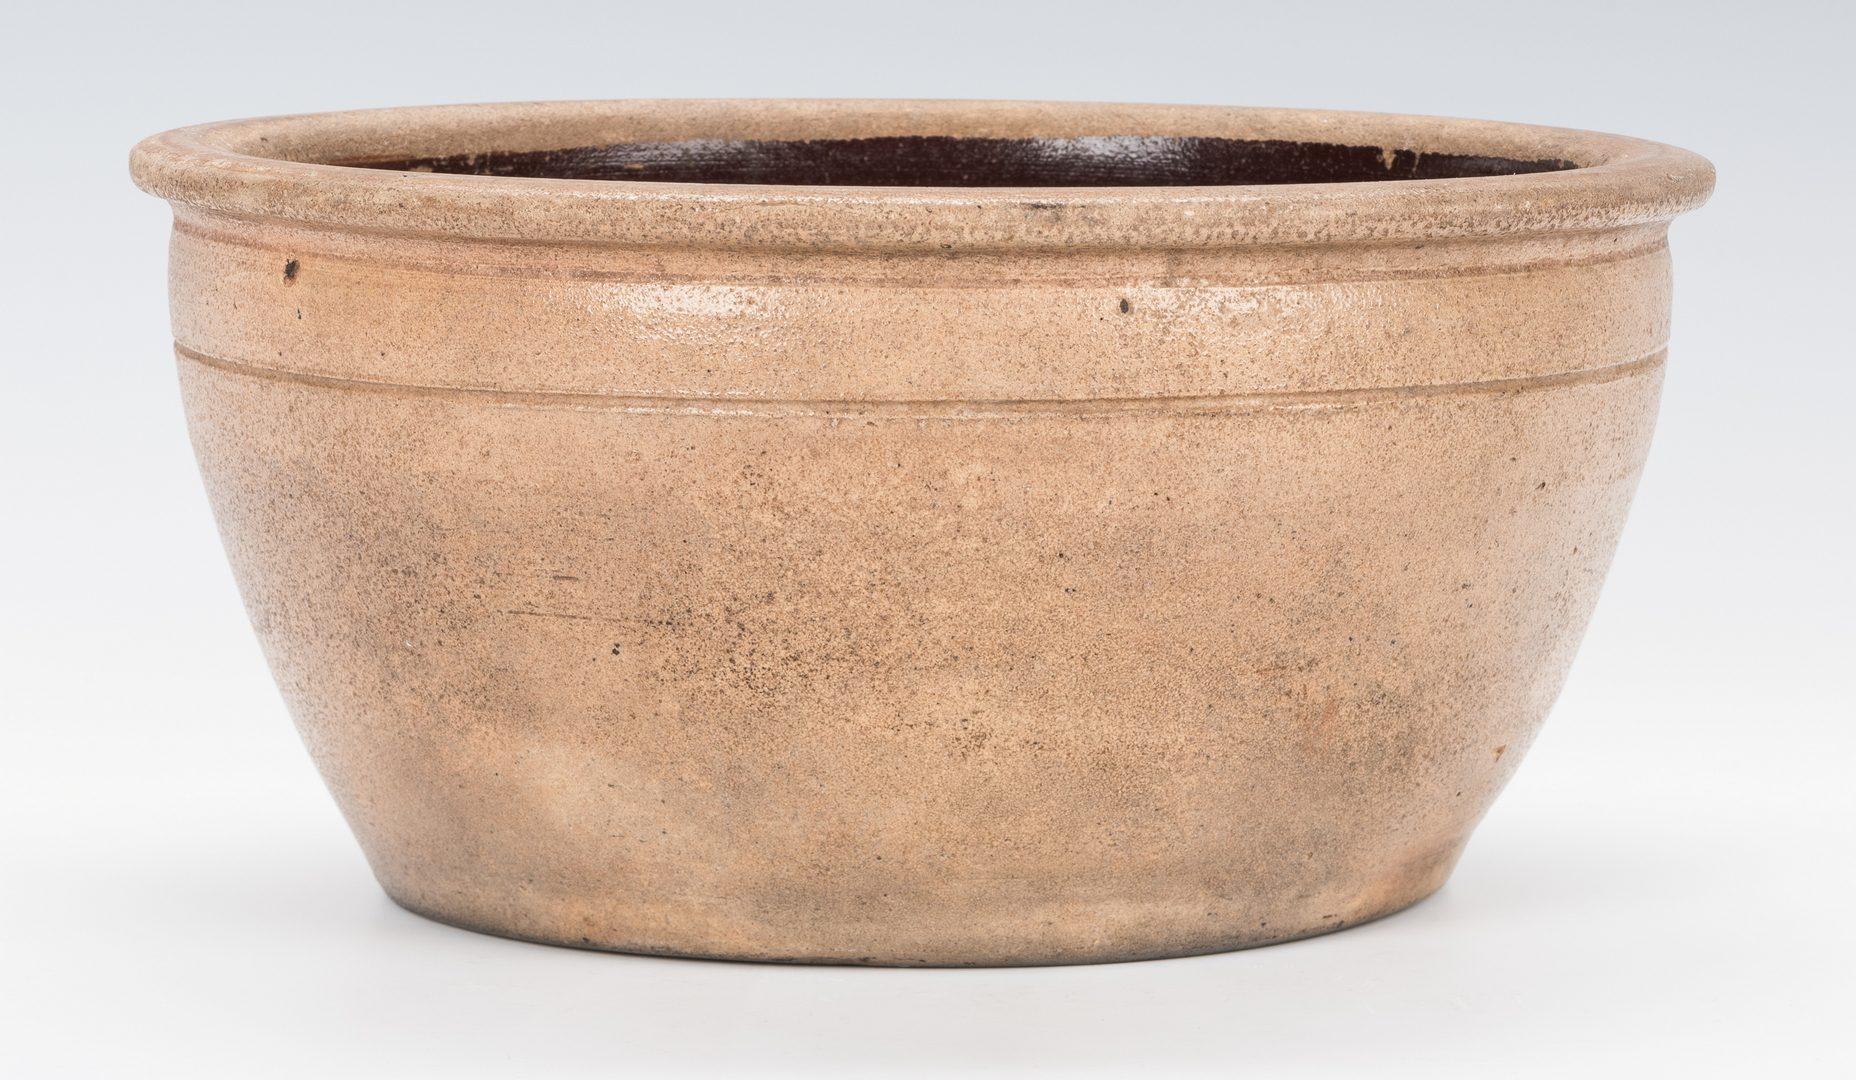 Lot 736: PA Stoneware Pottery Bowl, Cowden & Wilcox